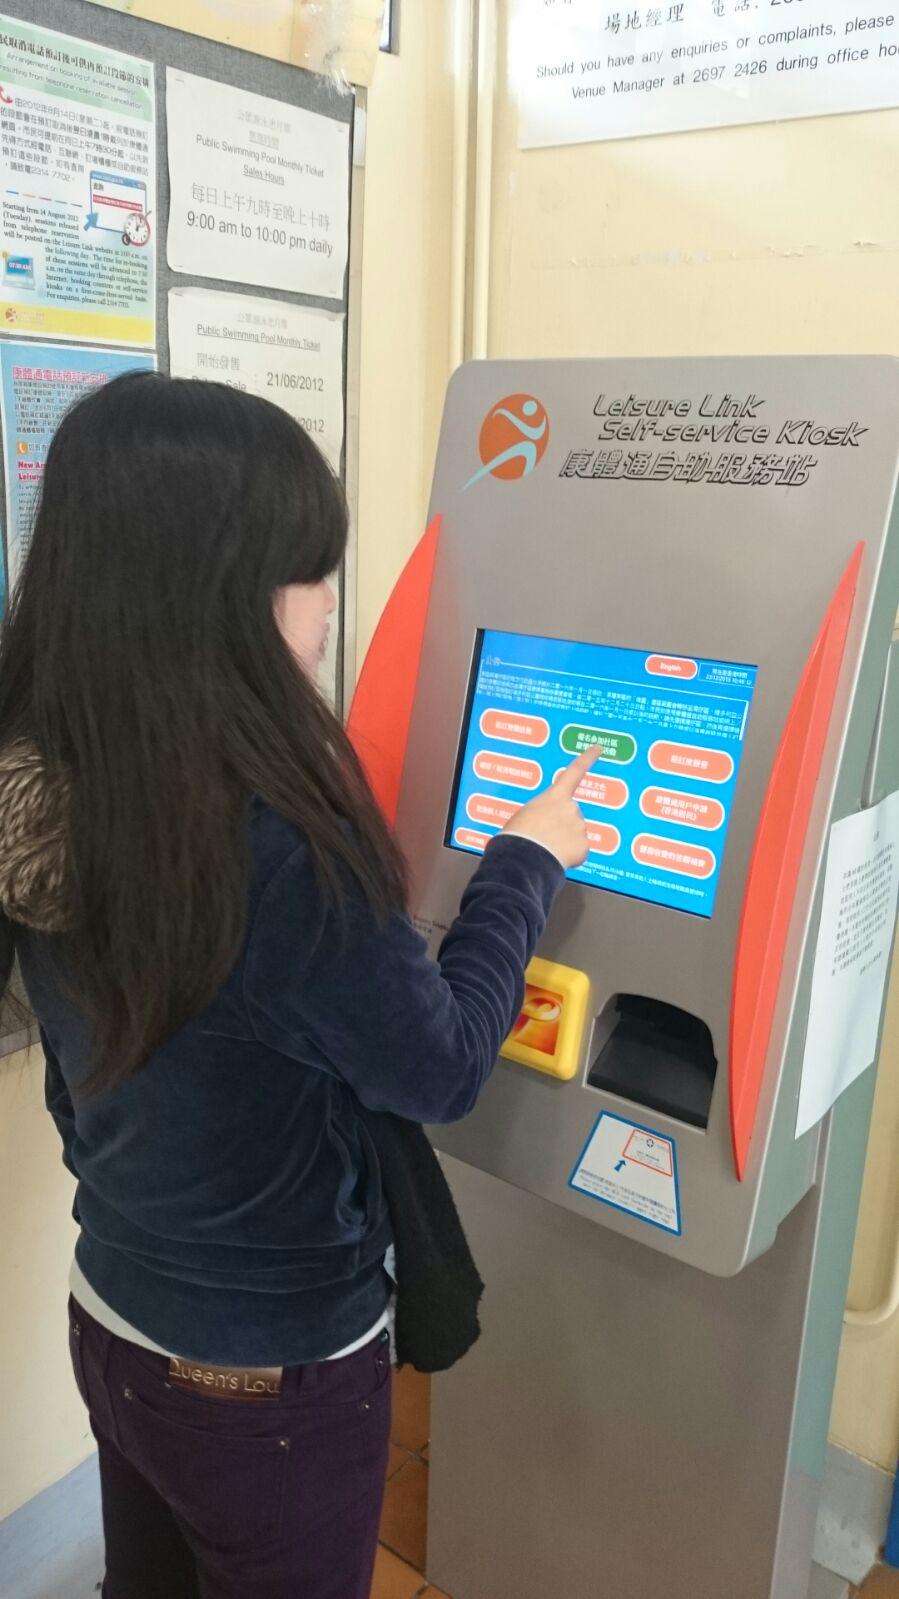 GovHK 香港政府一站通:康體通租訂設施及活動報名服務